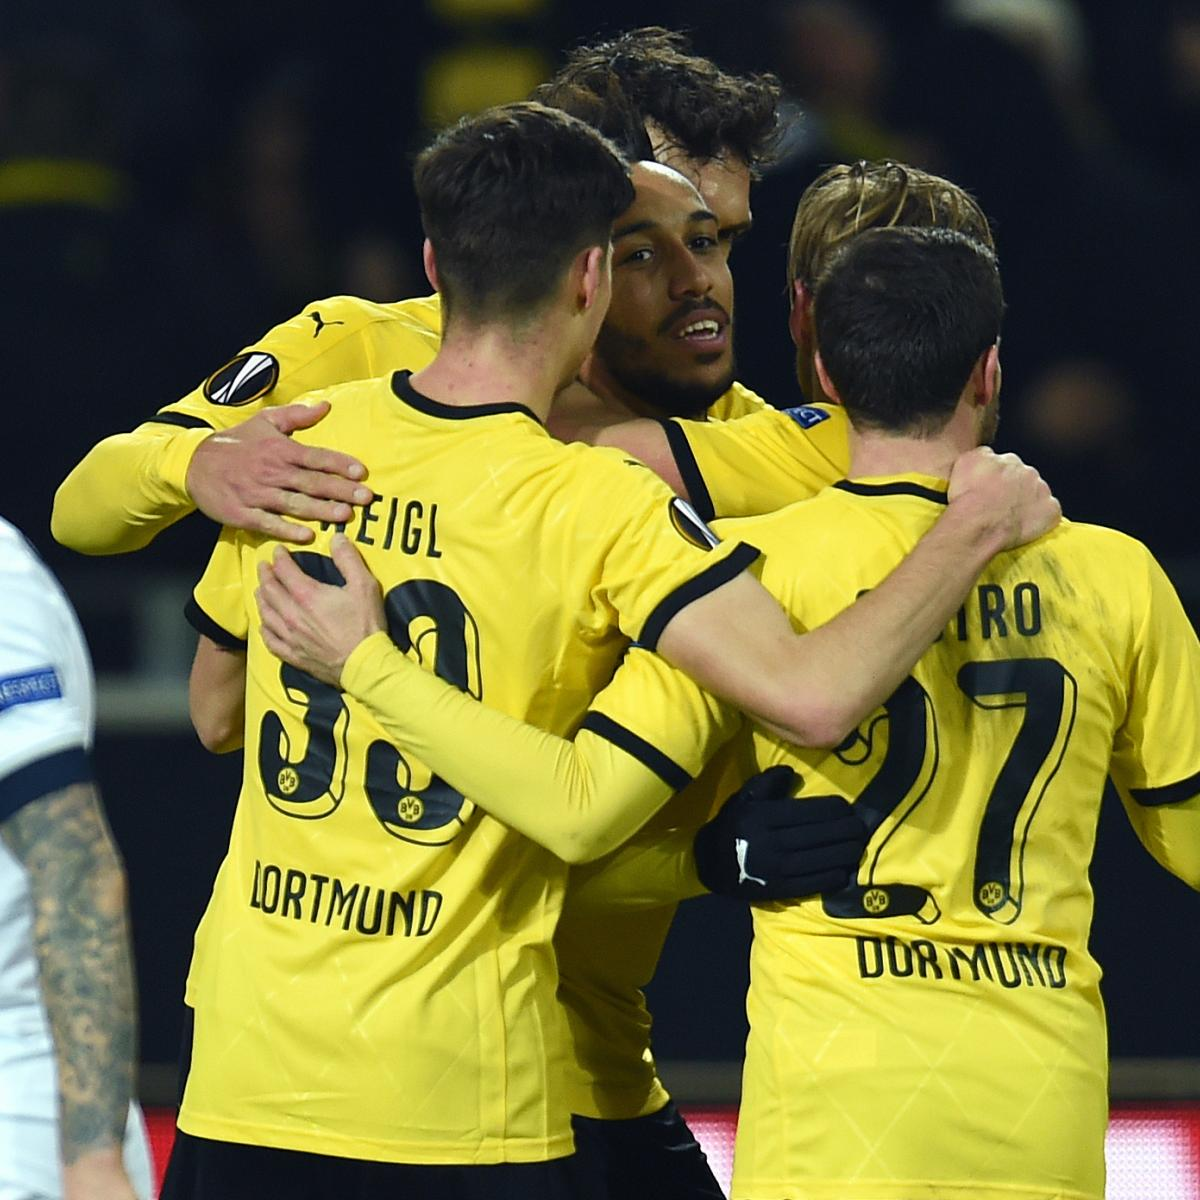 Tottenham 3 Fulham 1 Match Highlights Harry Kane Scores: Borussia Dortmund Vs. Tottenham: Score, Reaction From 2016